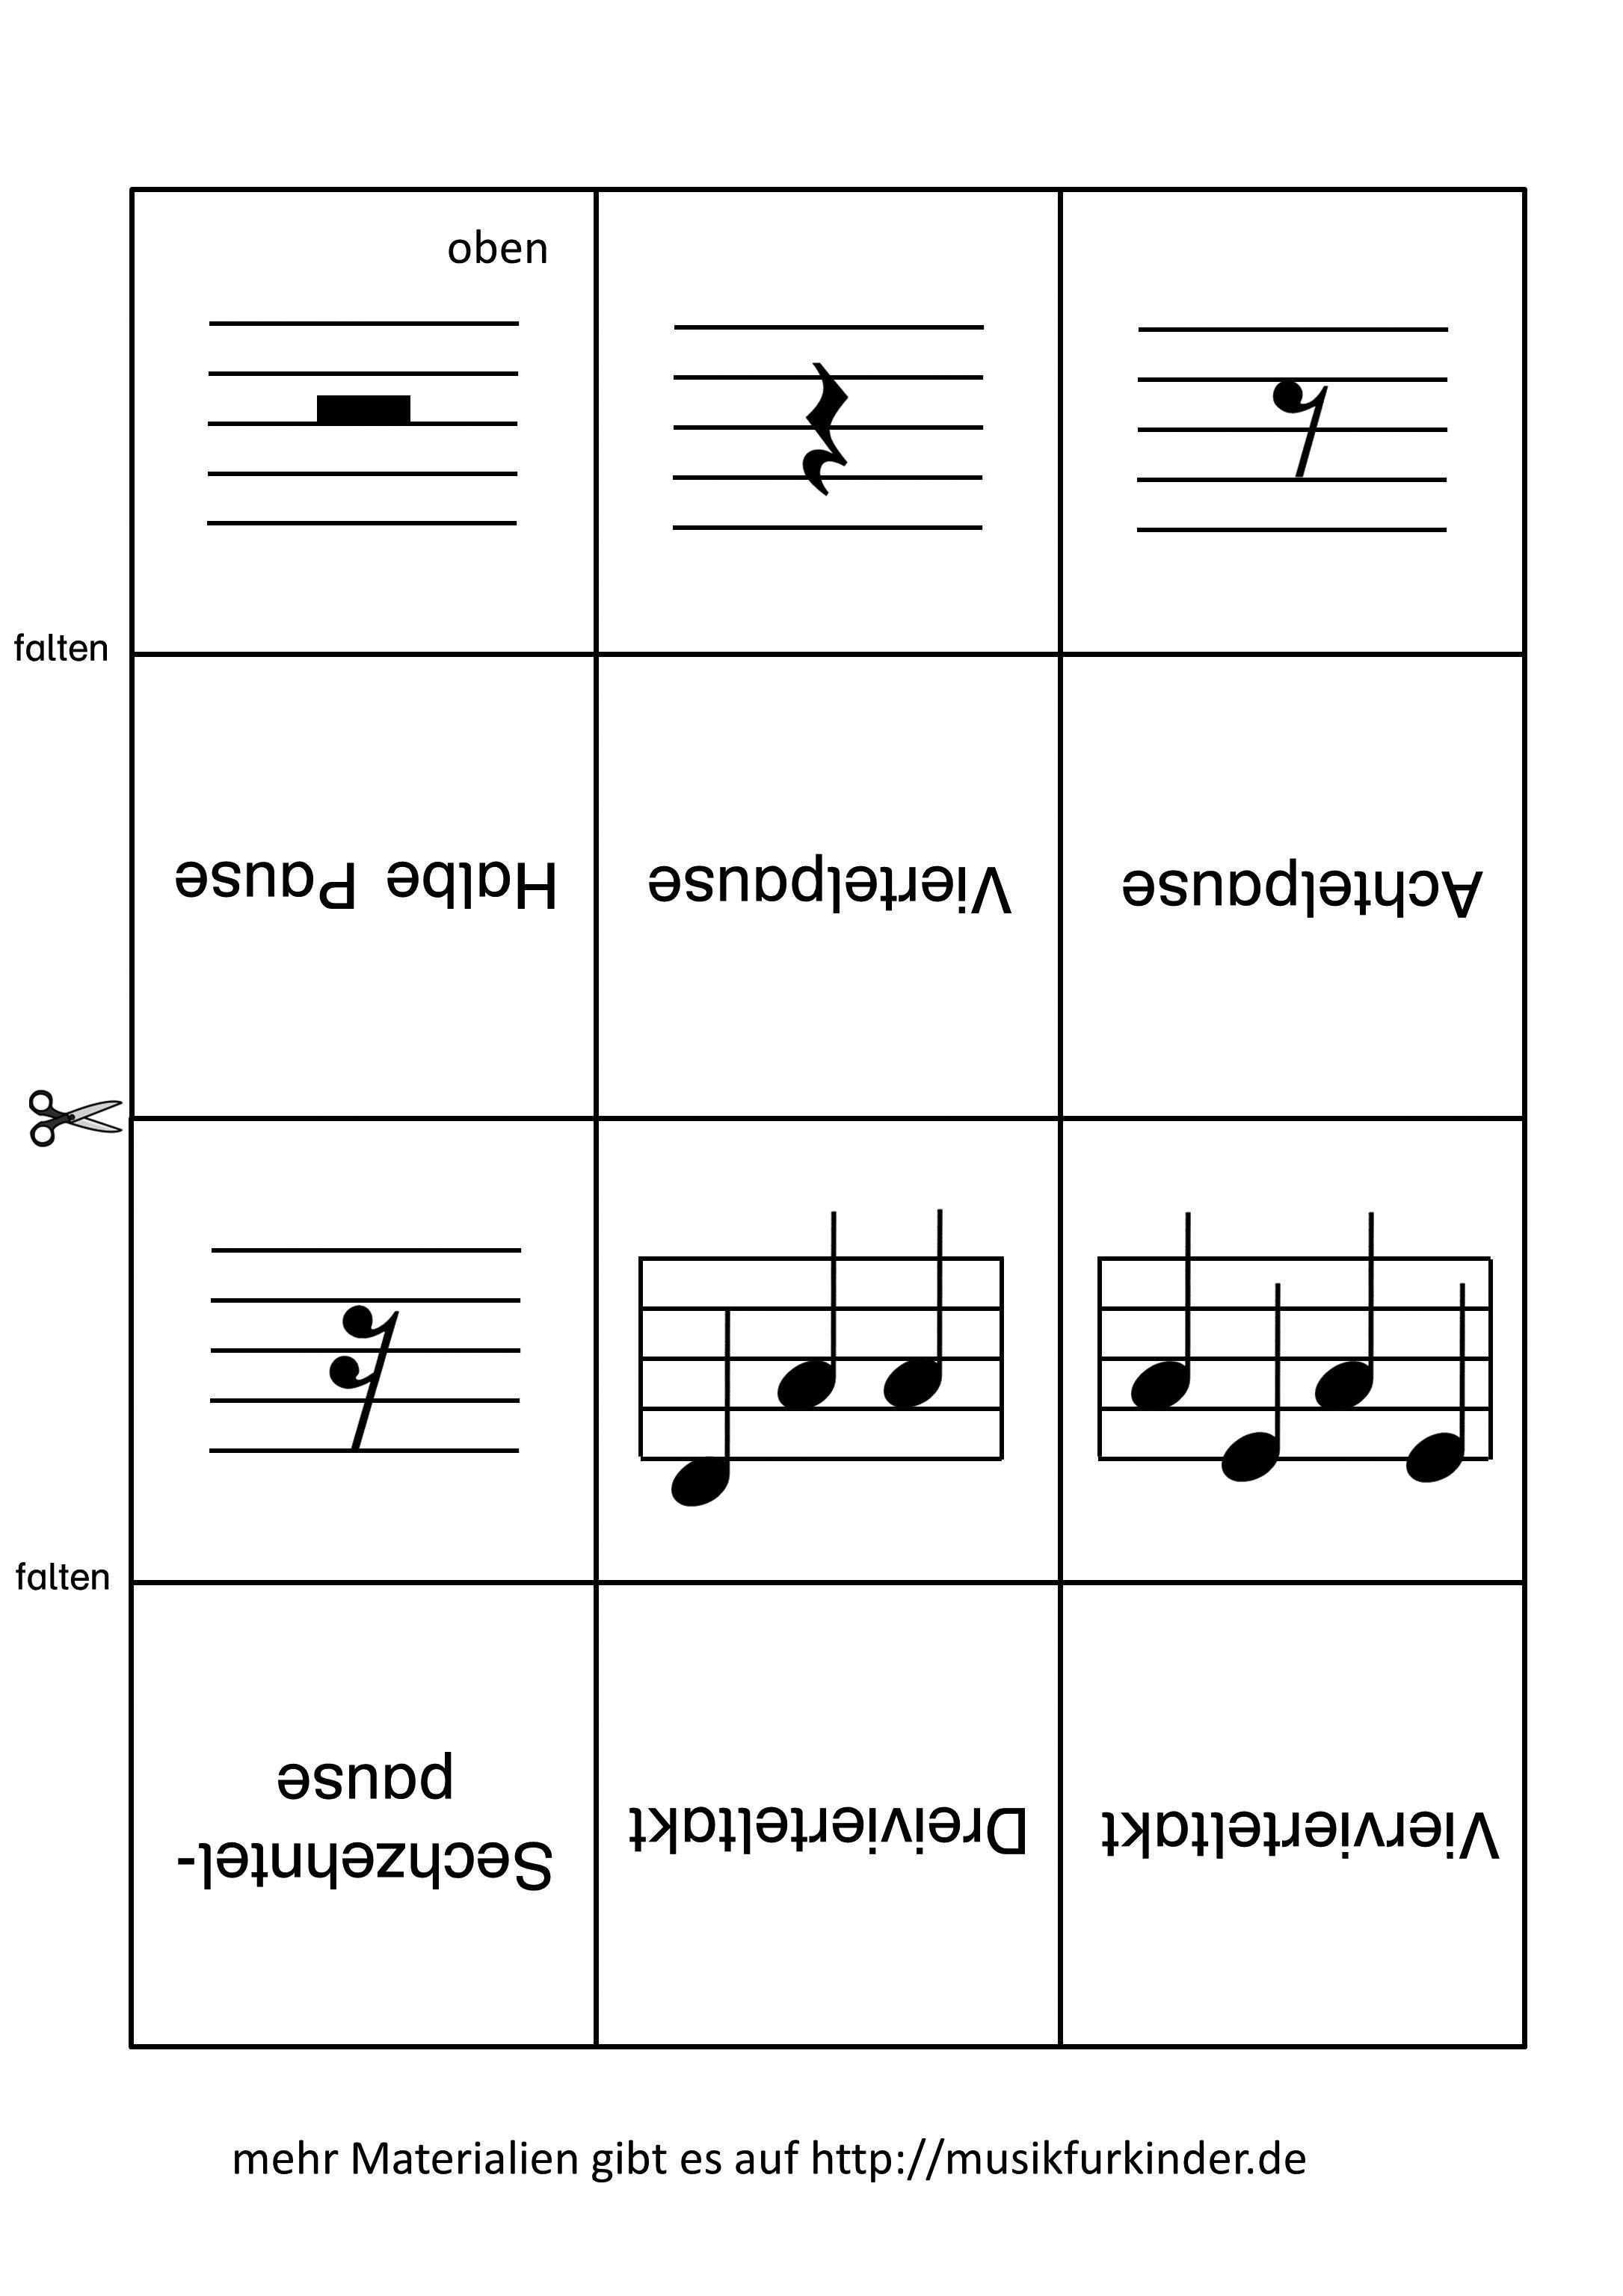 Notenwerte Memory Lernkarten 2 Musik Fur Kinder Notenwerte Lernkarten Noten Lernen